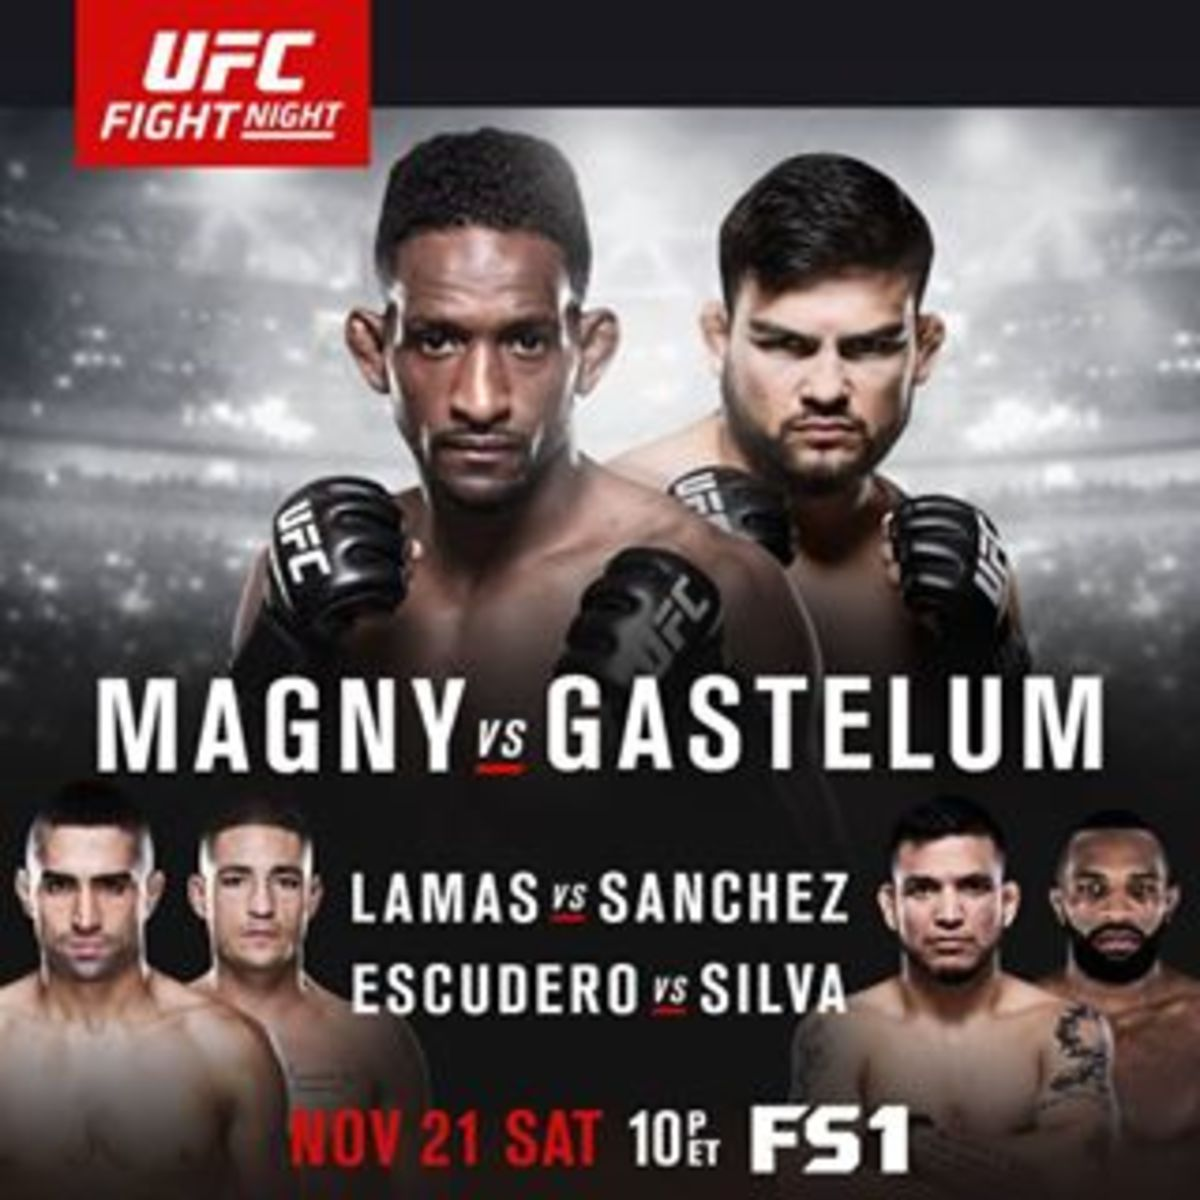 The UFC Fight Night 78 weigh-ins were held today in Monterrey.